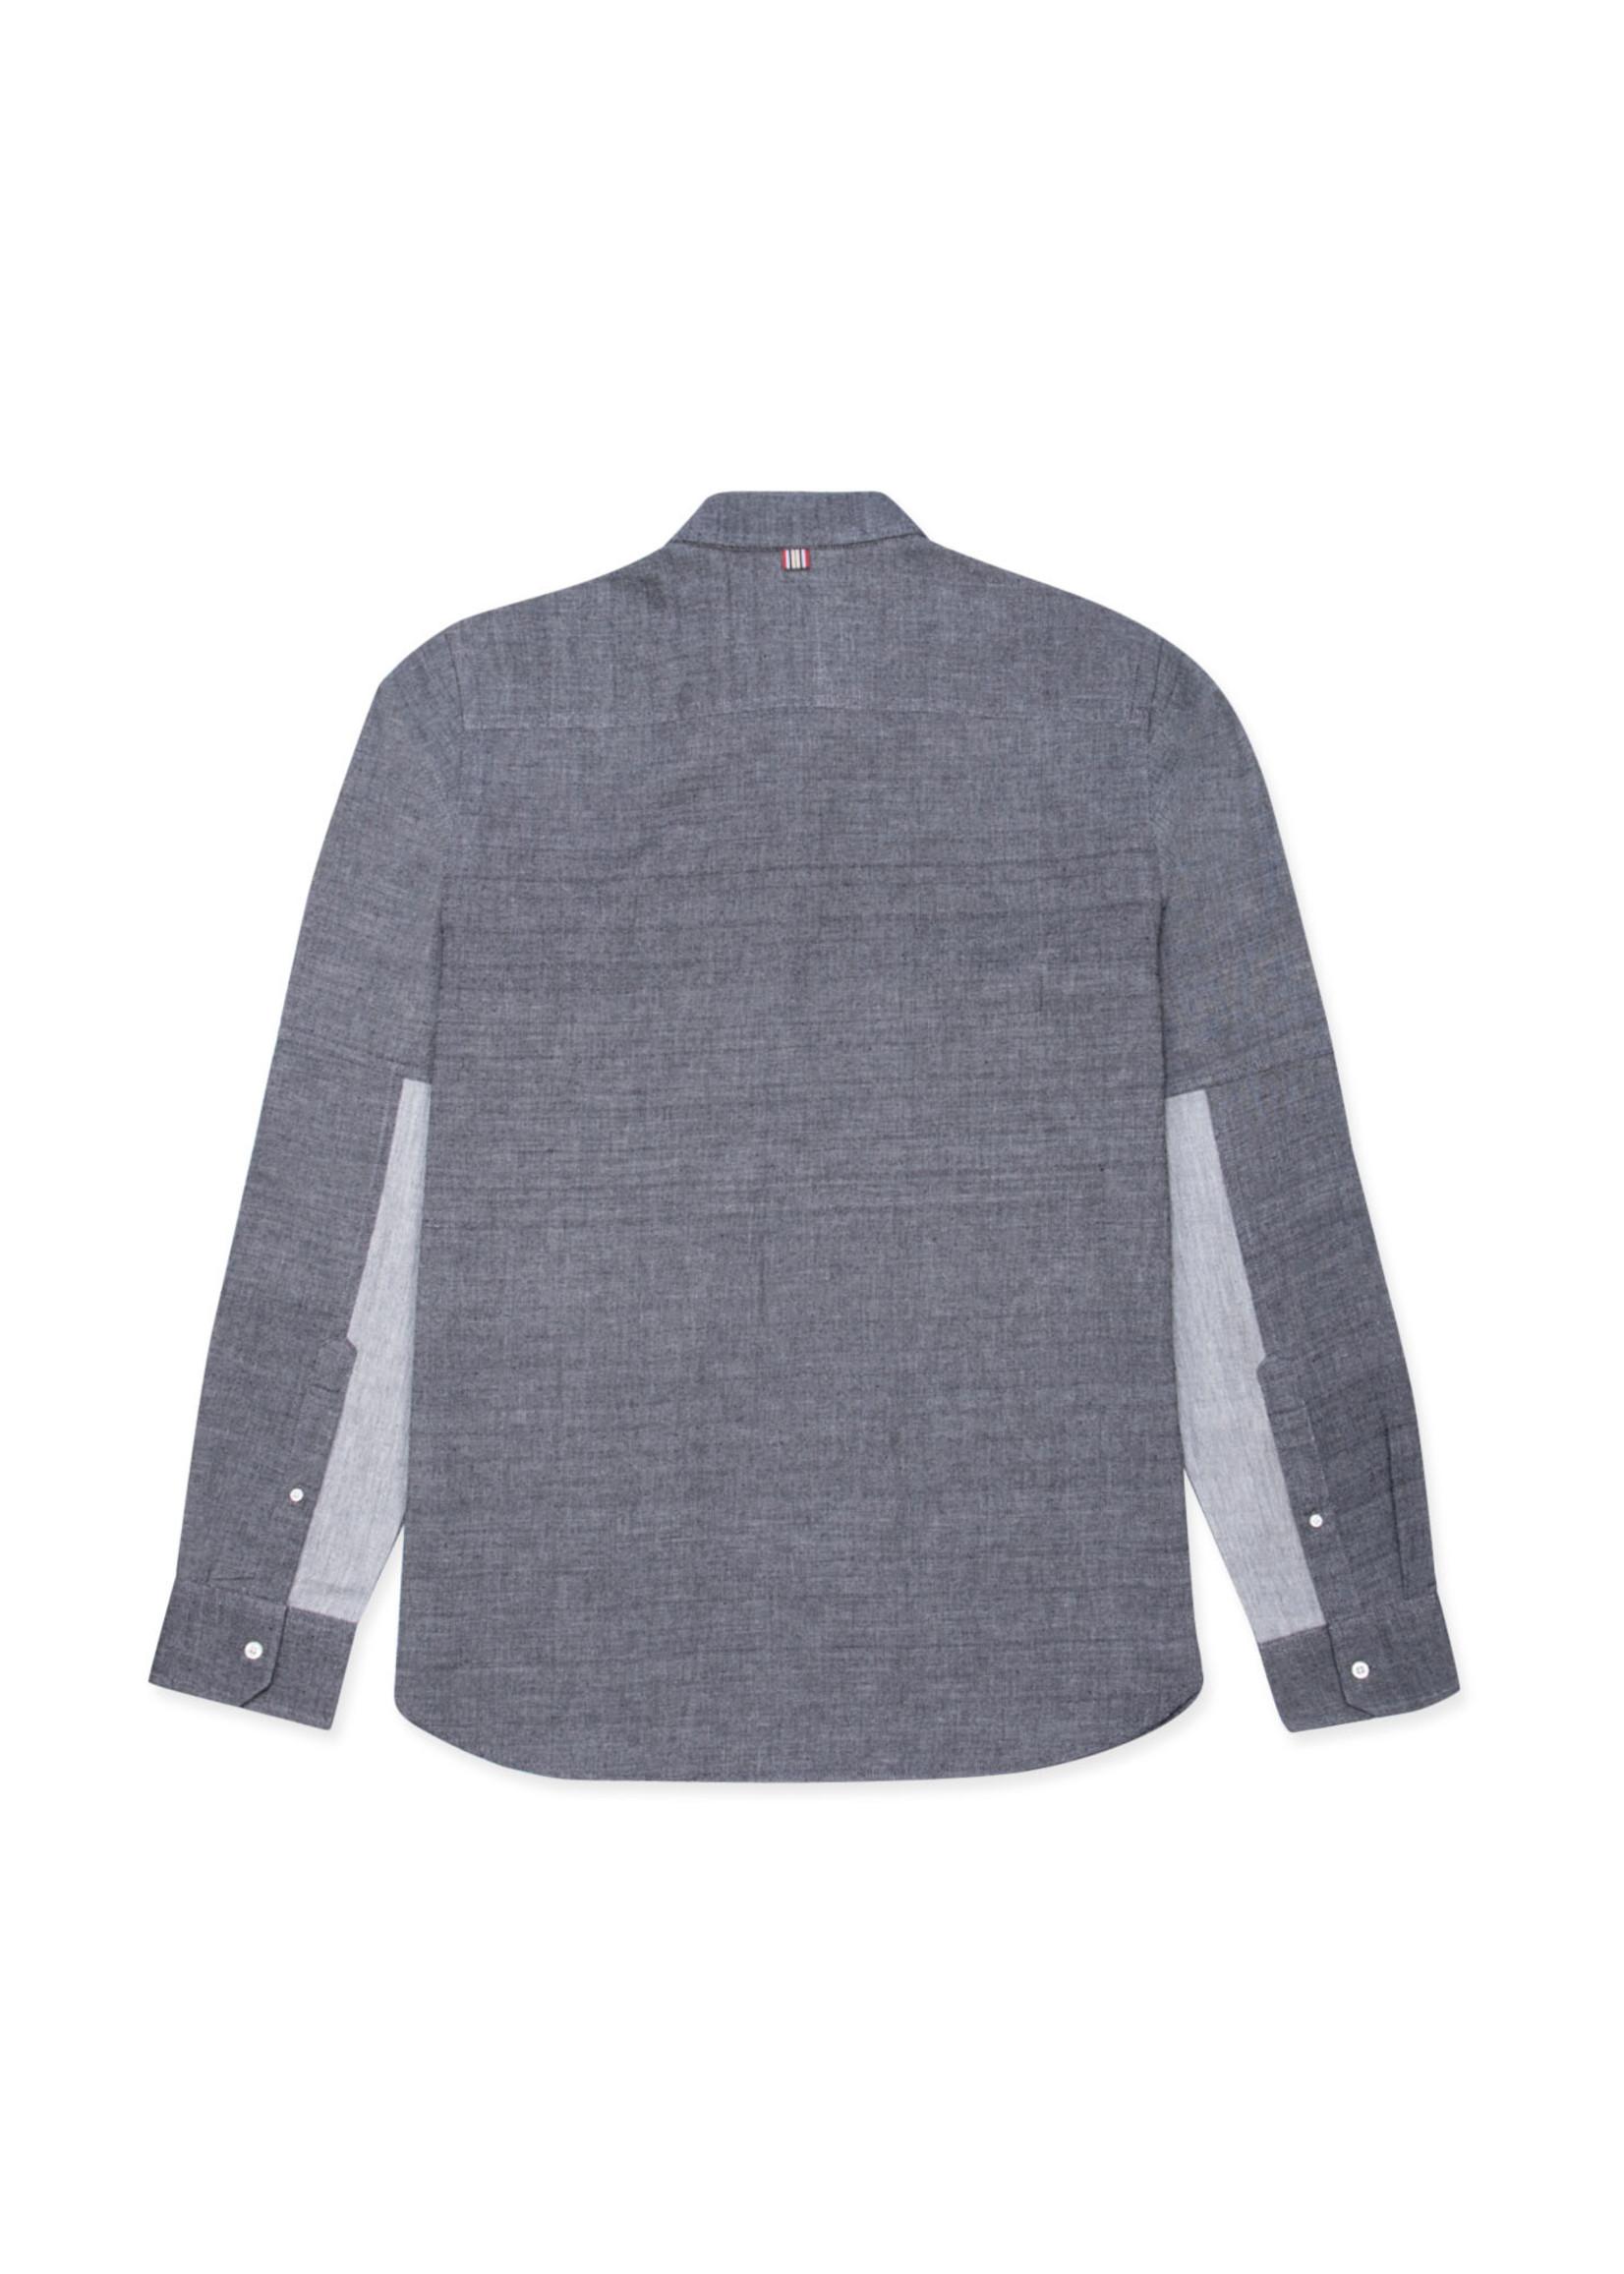 Kardo Stevie Charcoal Twill Sport Shirt by Kardo